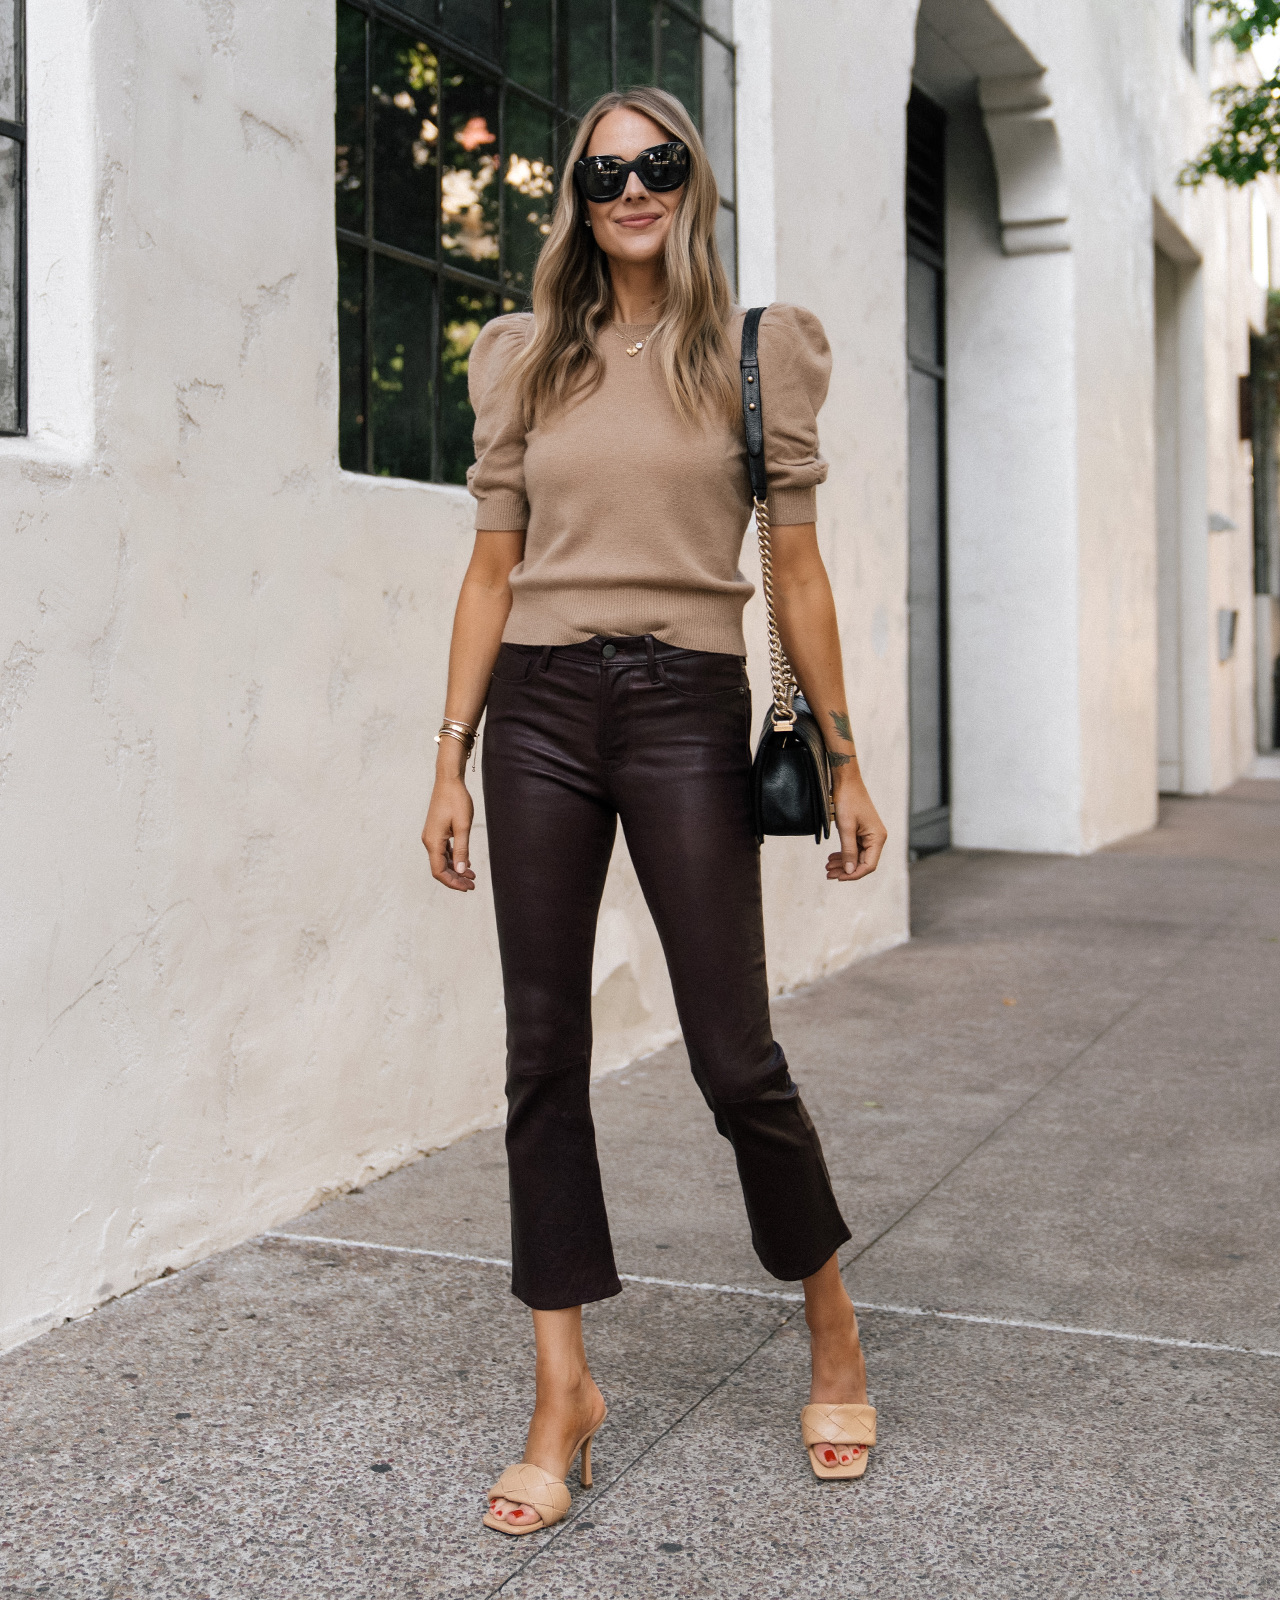 Fashion Jackson Wearing Camel Puff Sleeve Sweater Burgundy Leather Pants Tan Heeled Sandals Chanel Black Boy Bag